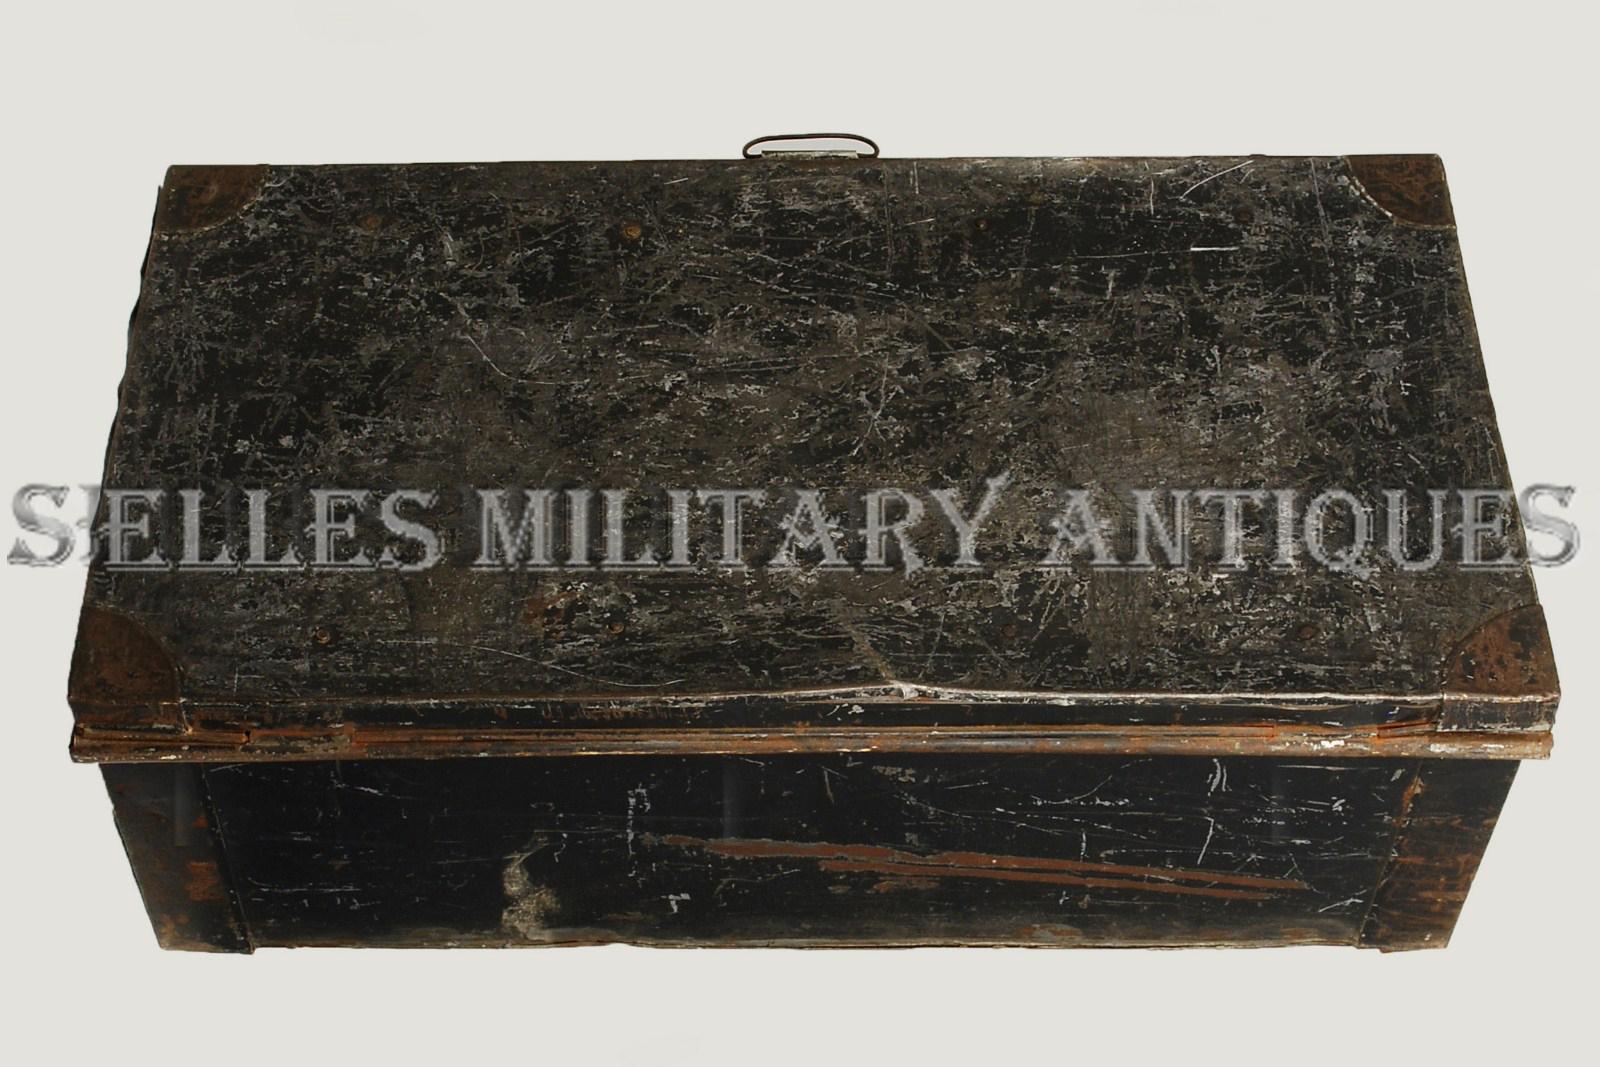 static line military jean michel selles cantine major. Black Bedroom Furniture Sets. Home Design Ideas